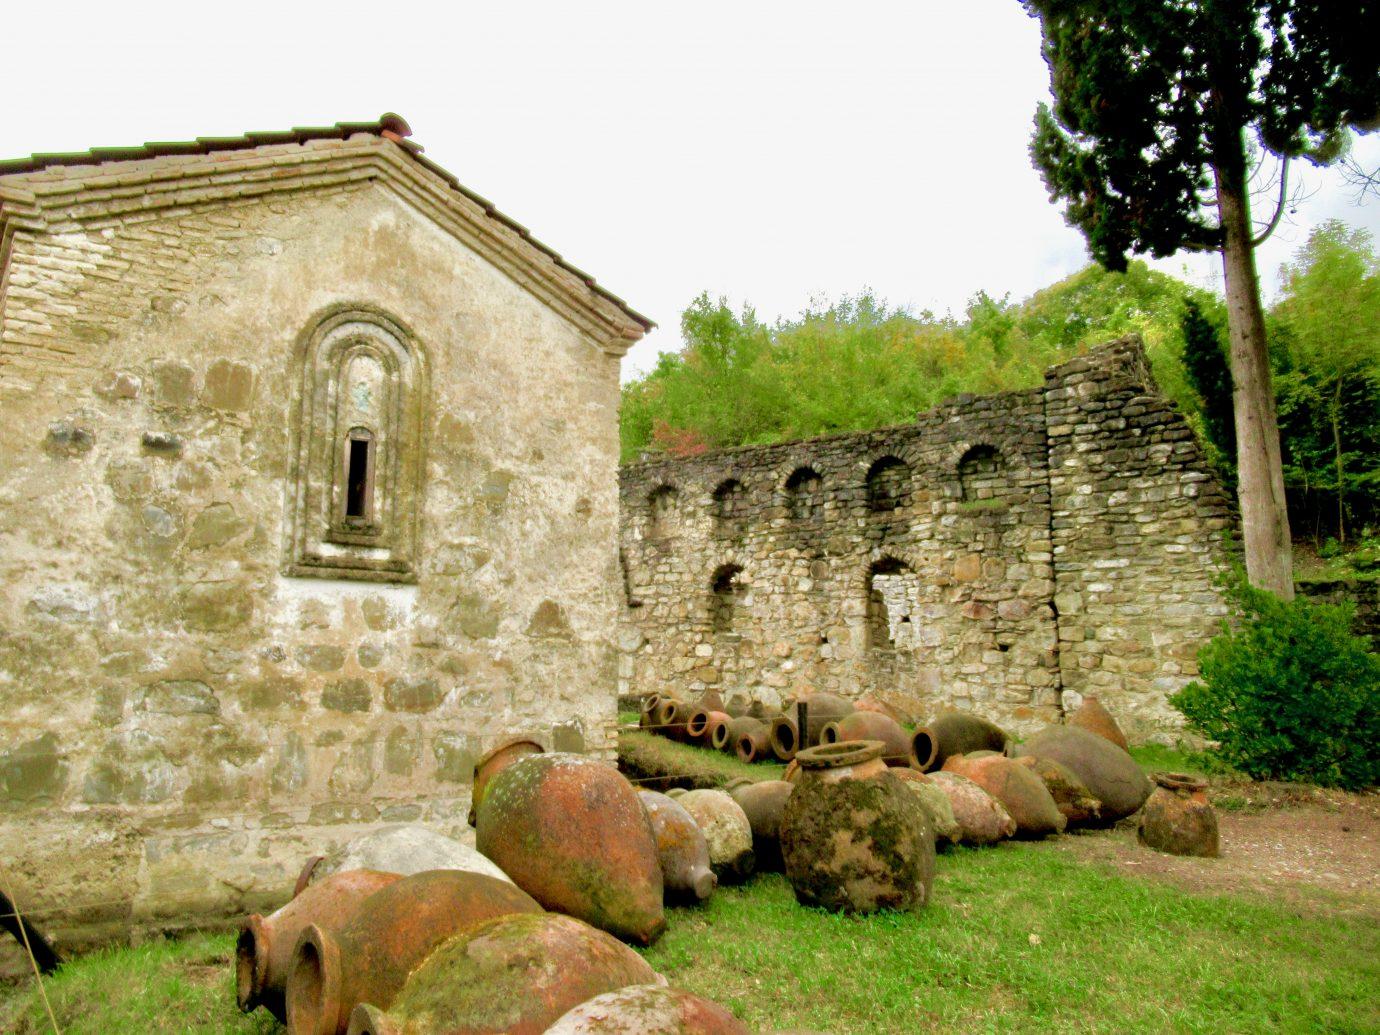 Qvevris in monastery yard